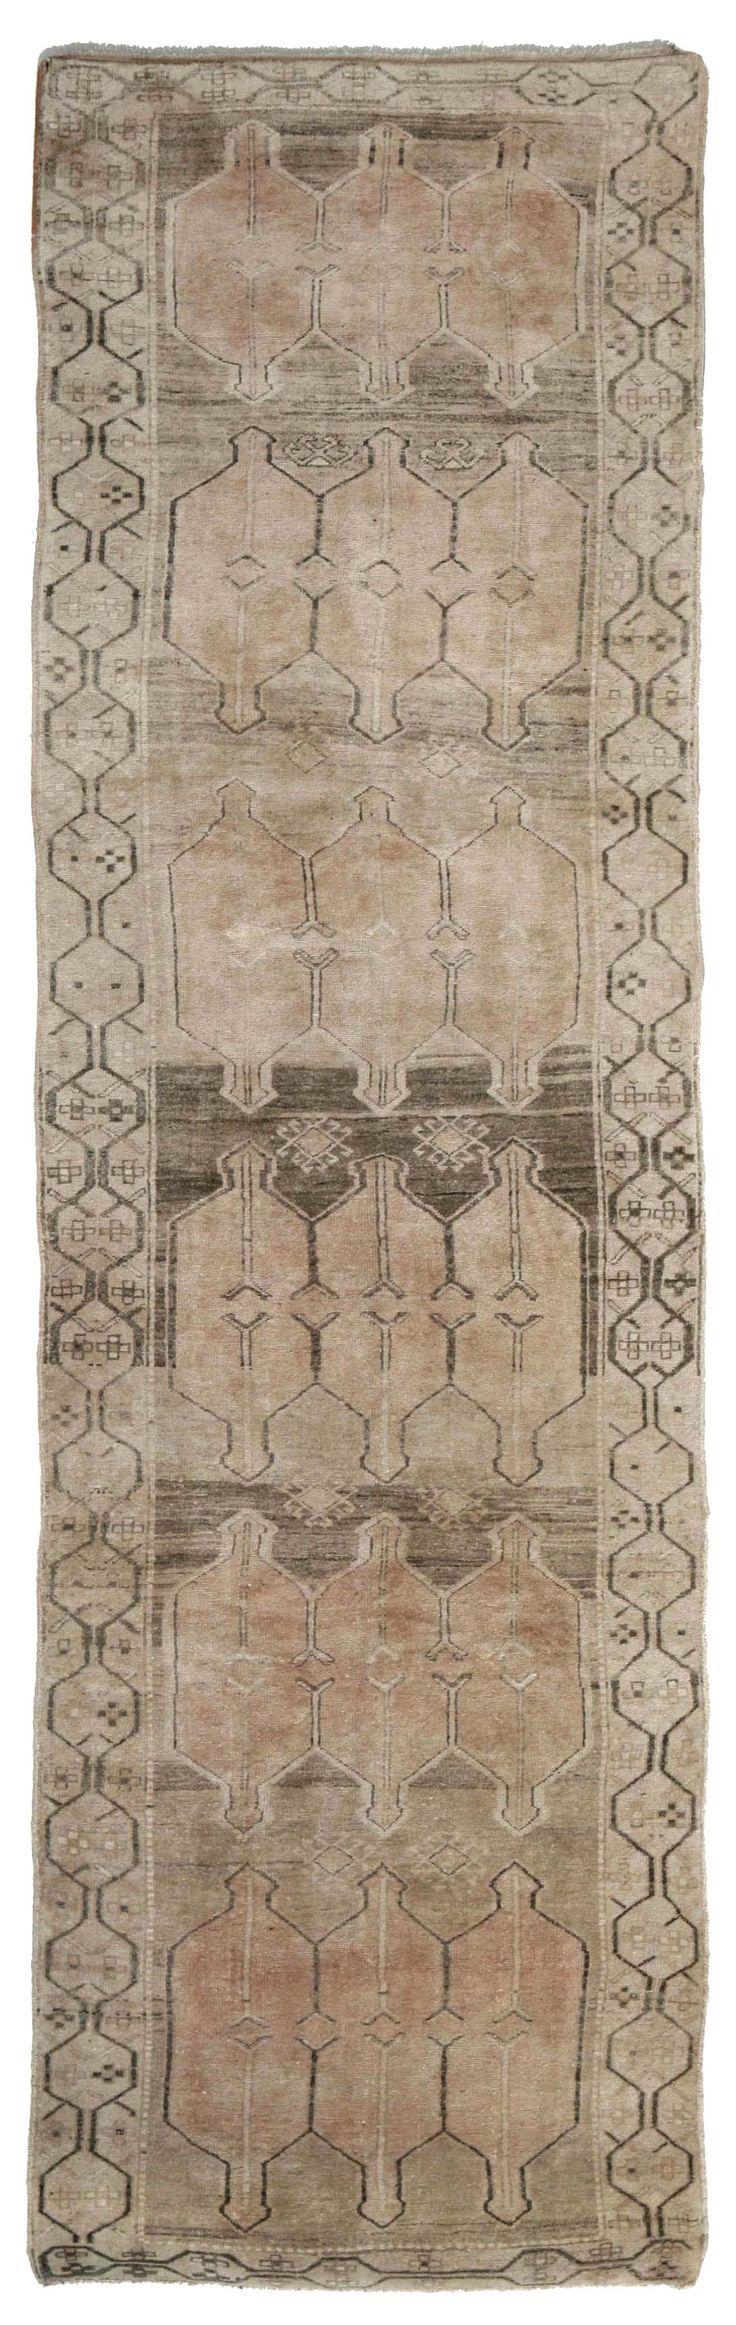 Vintage Oushak Rugs... simply gorgeous.